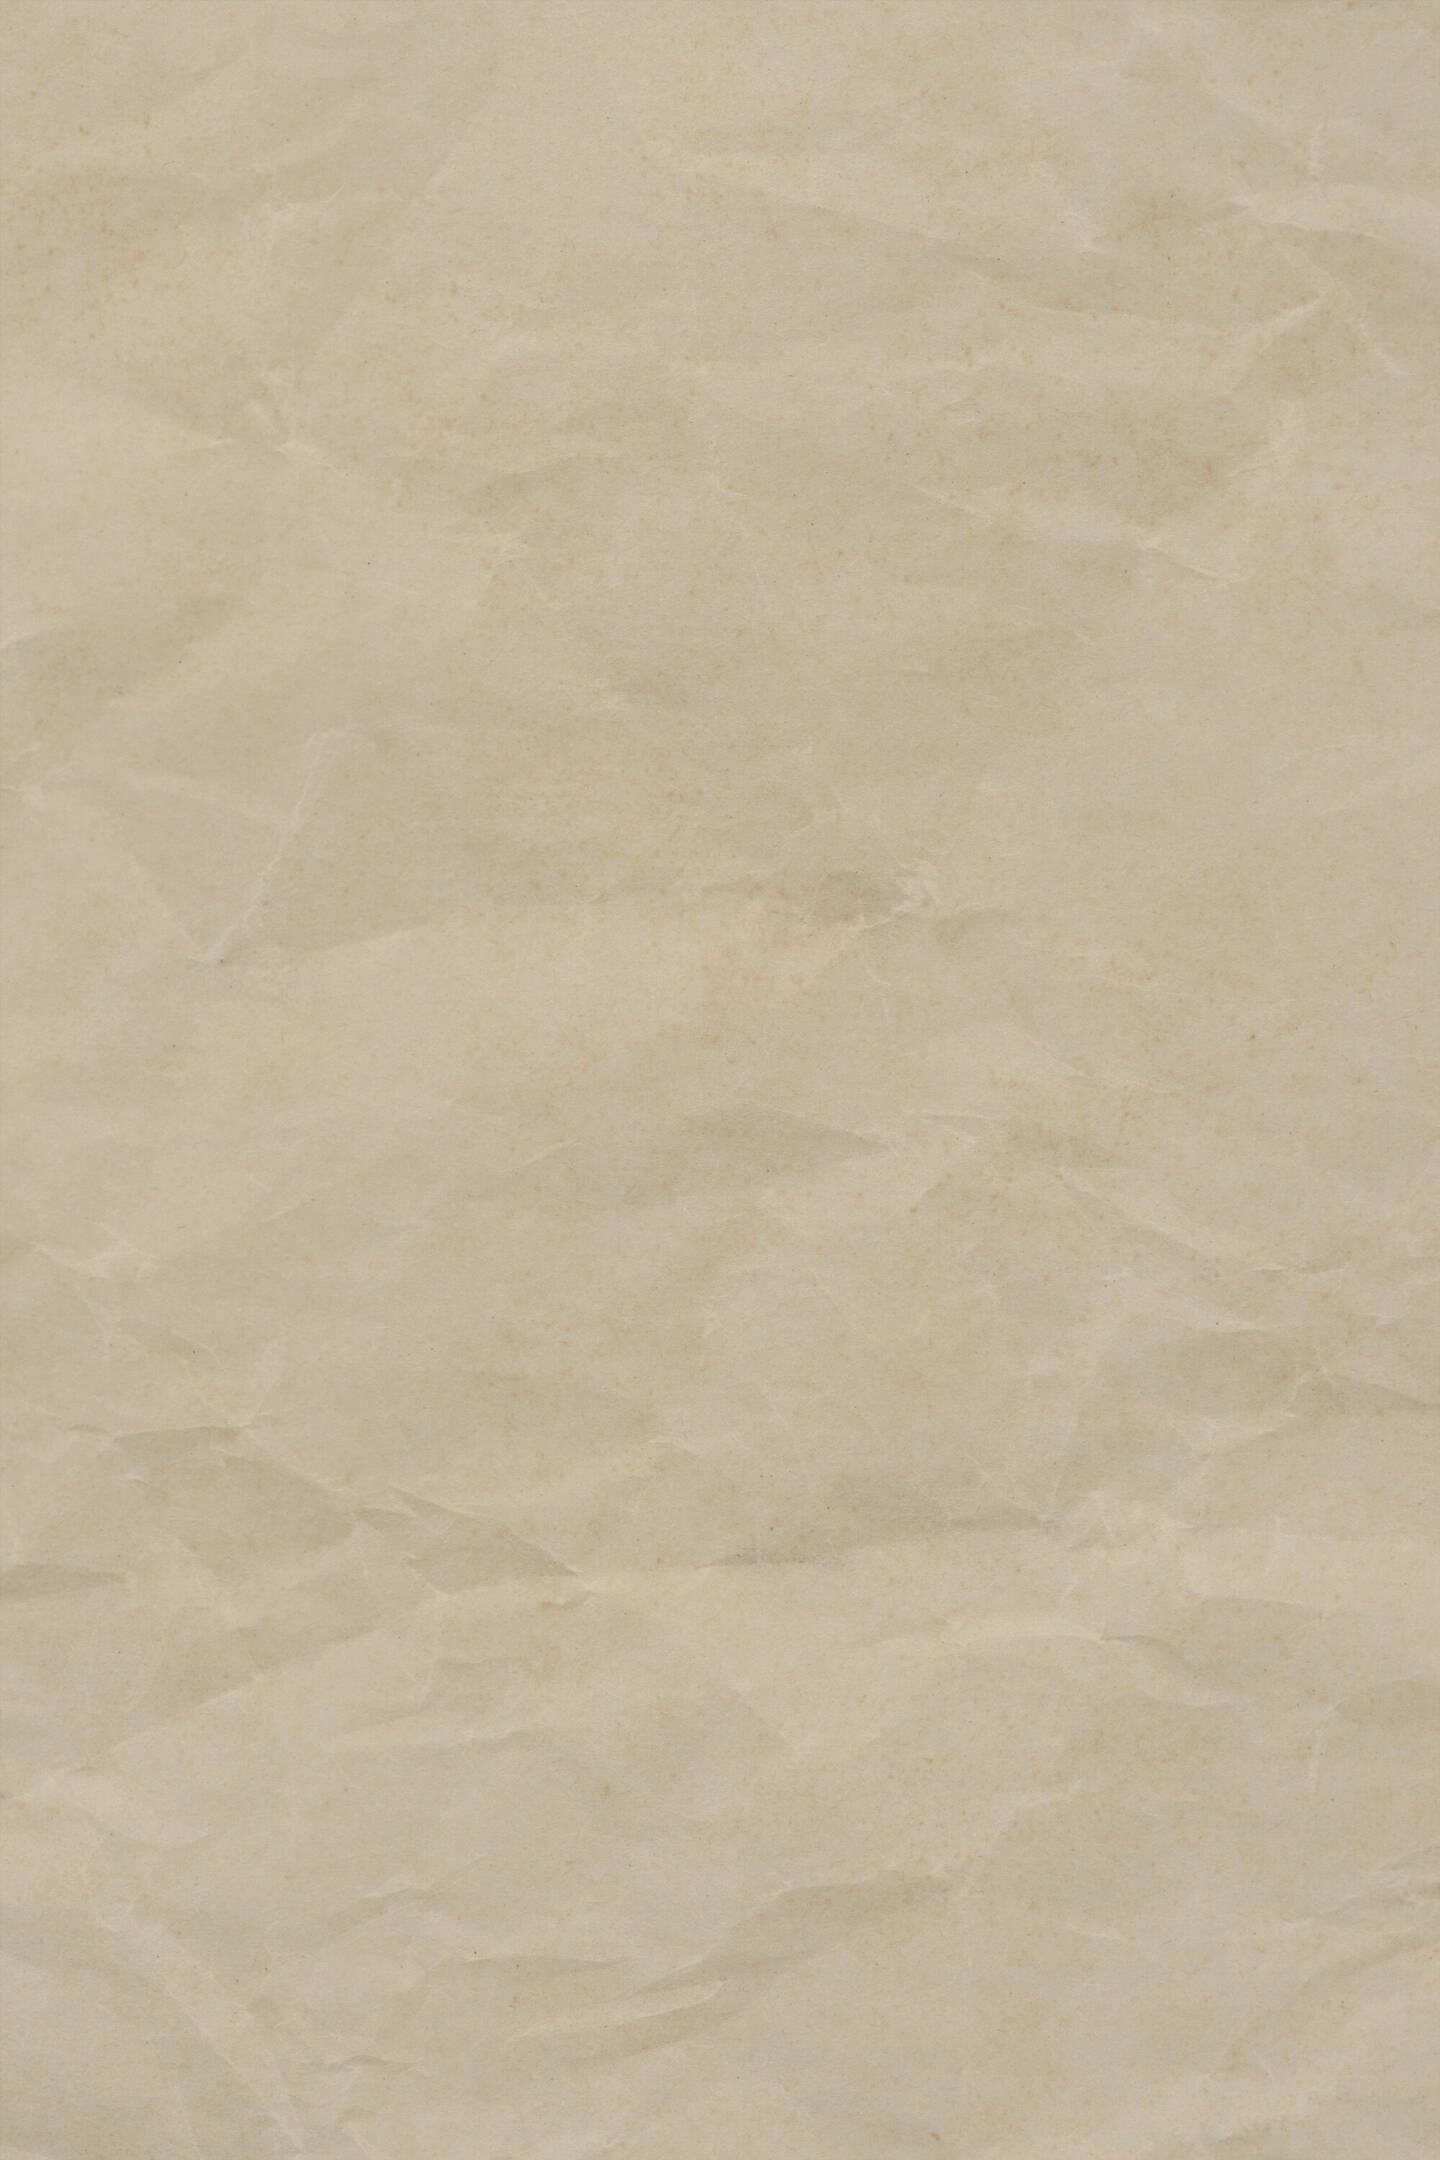 bg paper texture